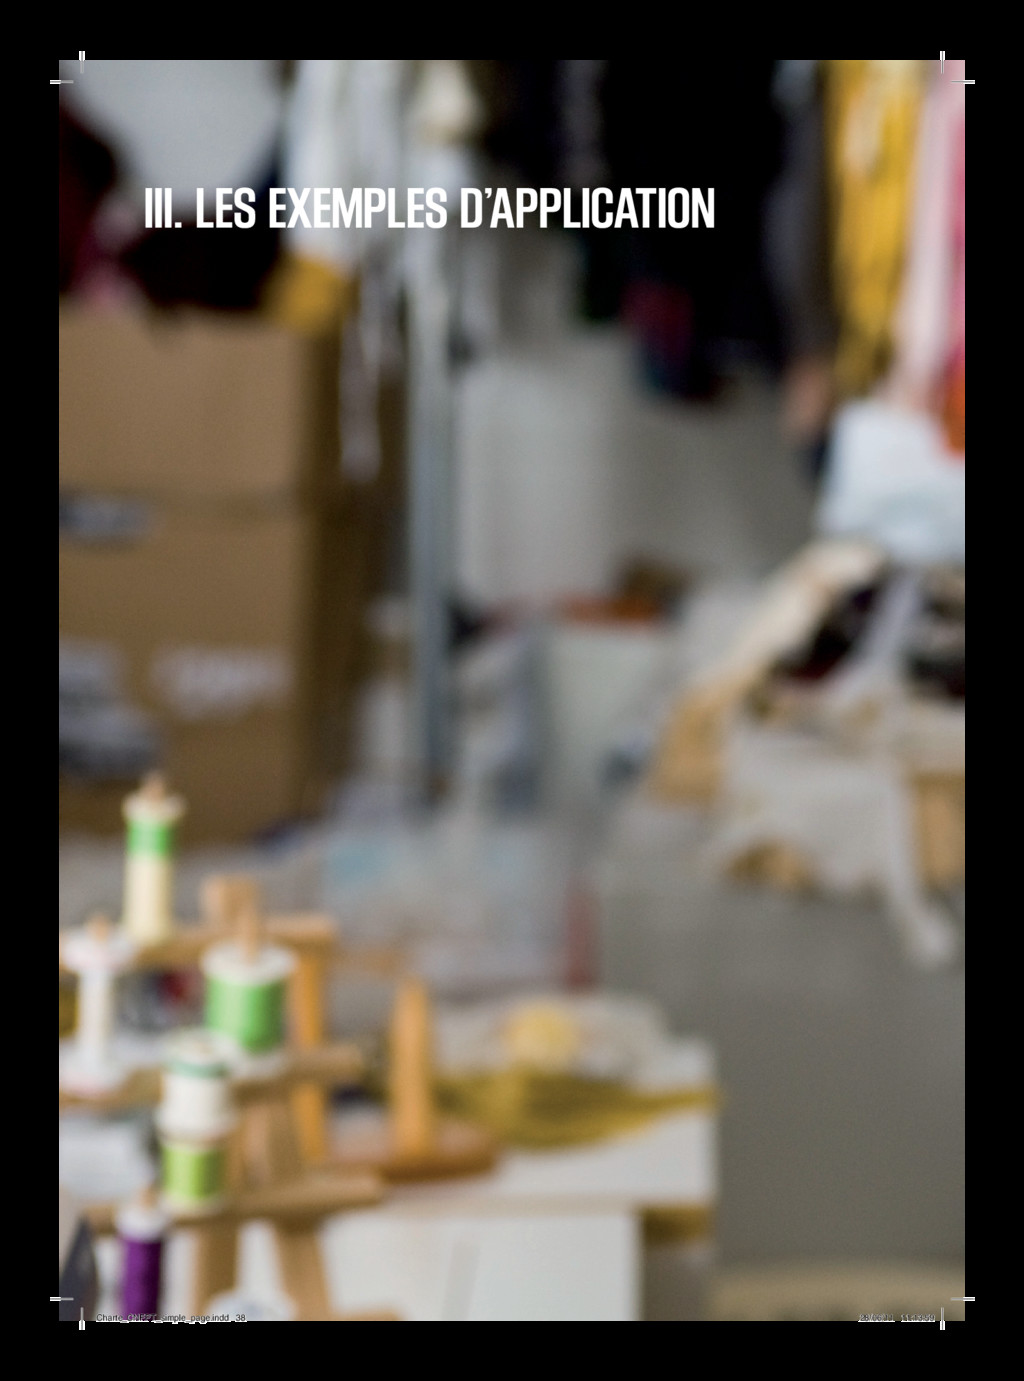 III. LES EXEMPLES D'APPLICATION Charte_CNFPT_si...